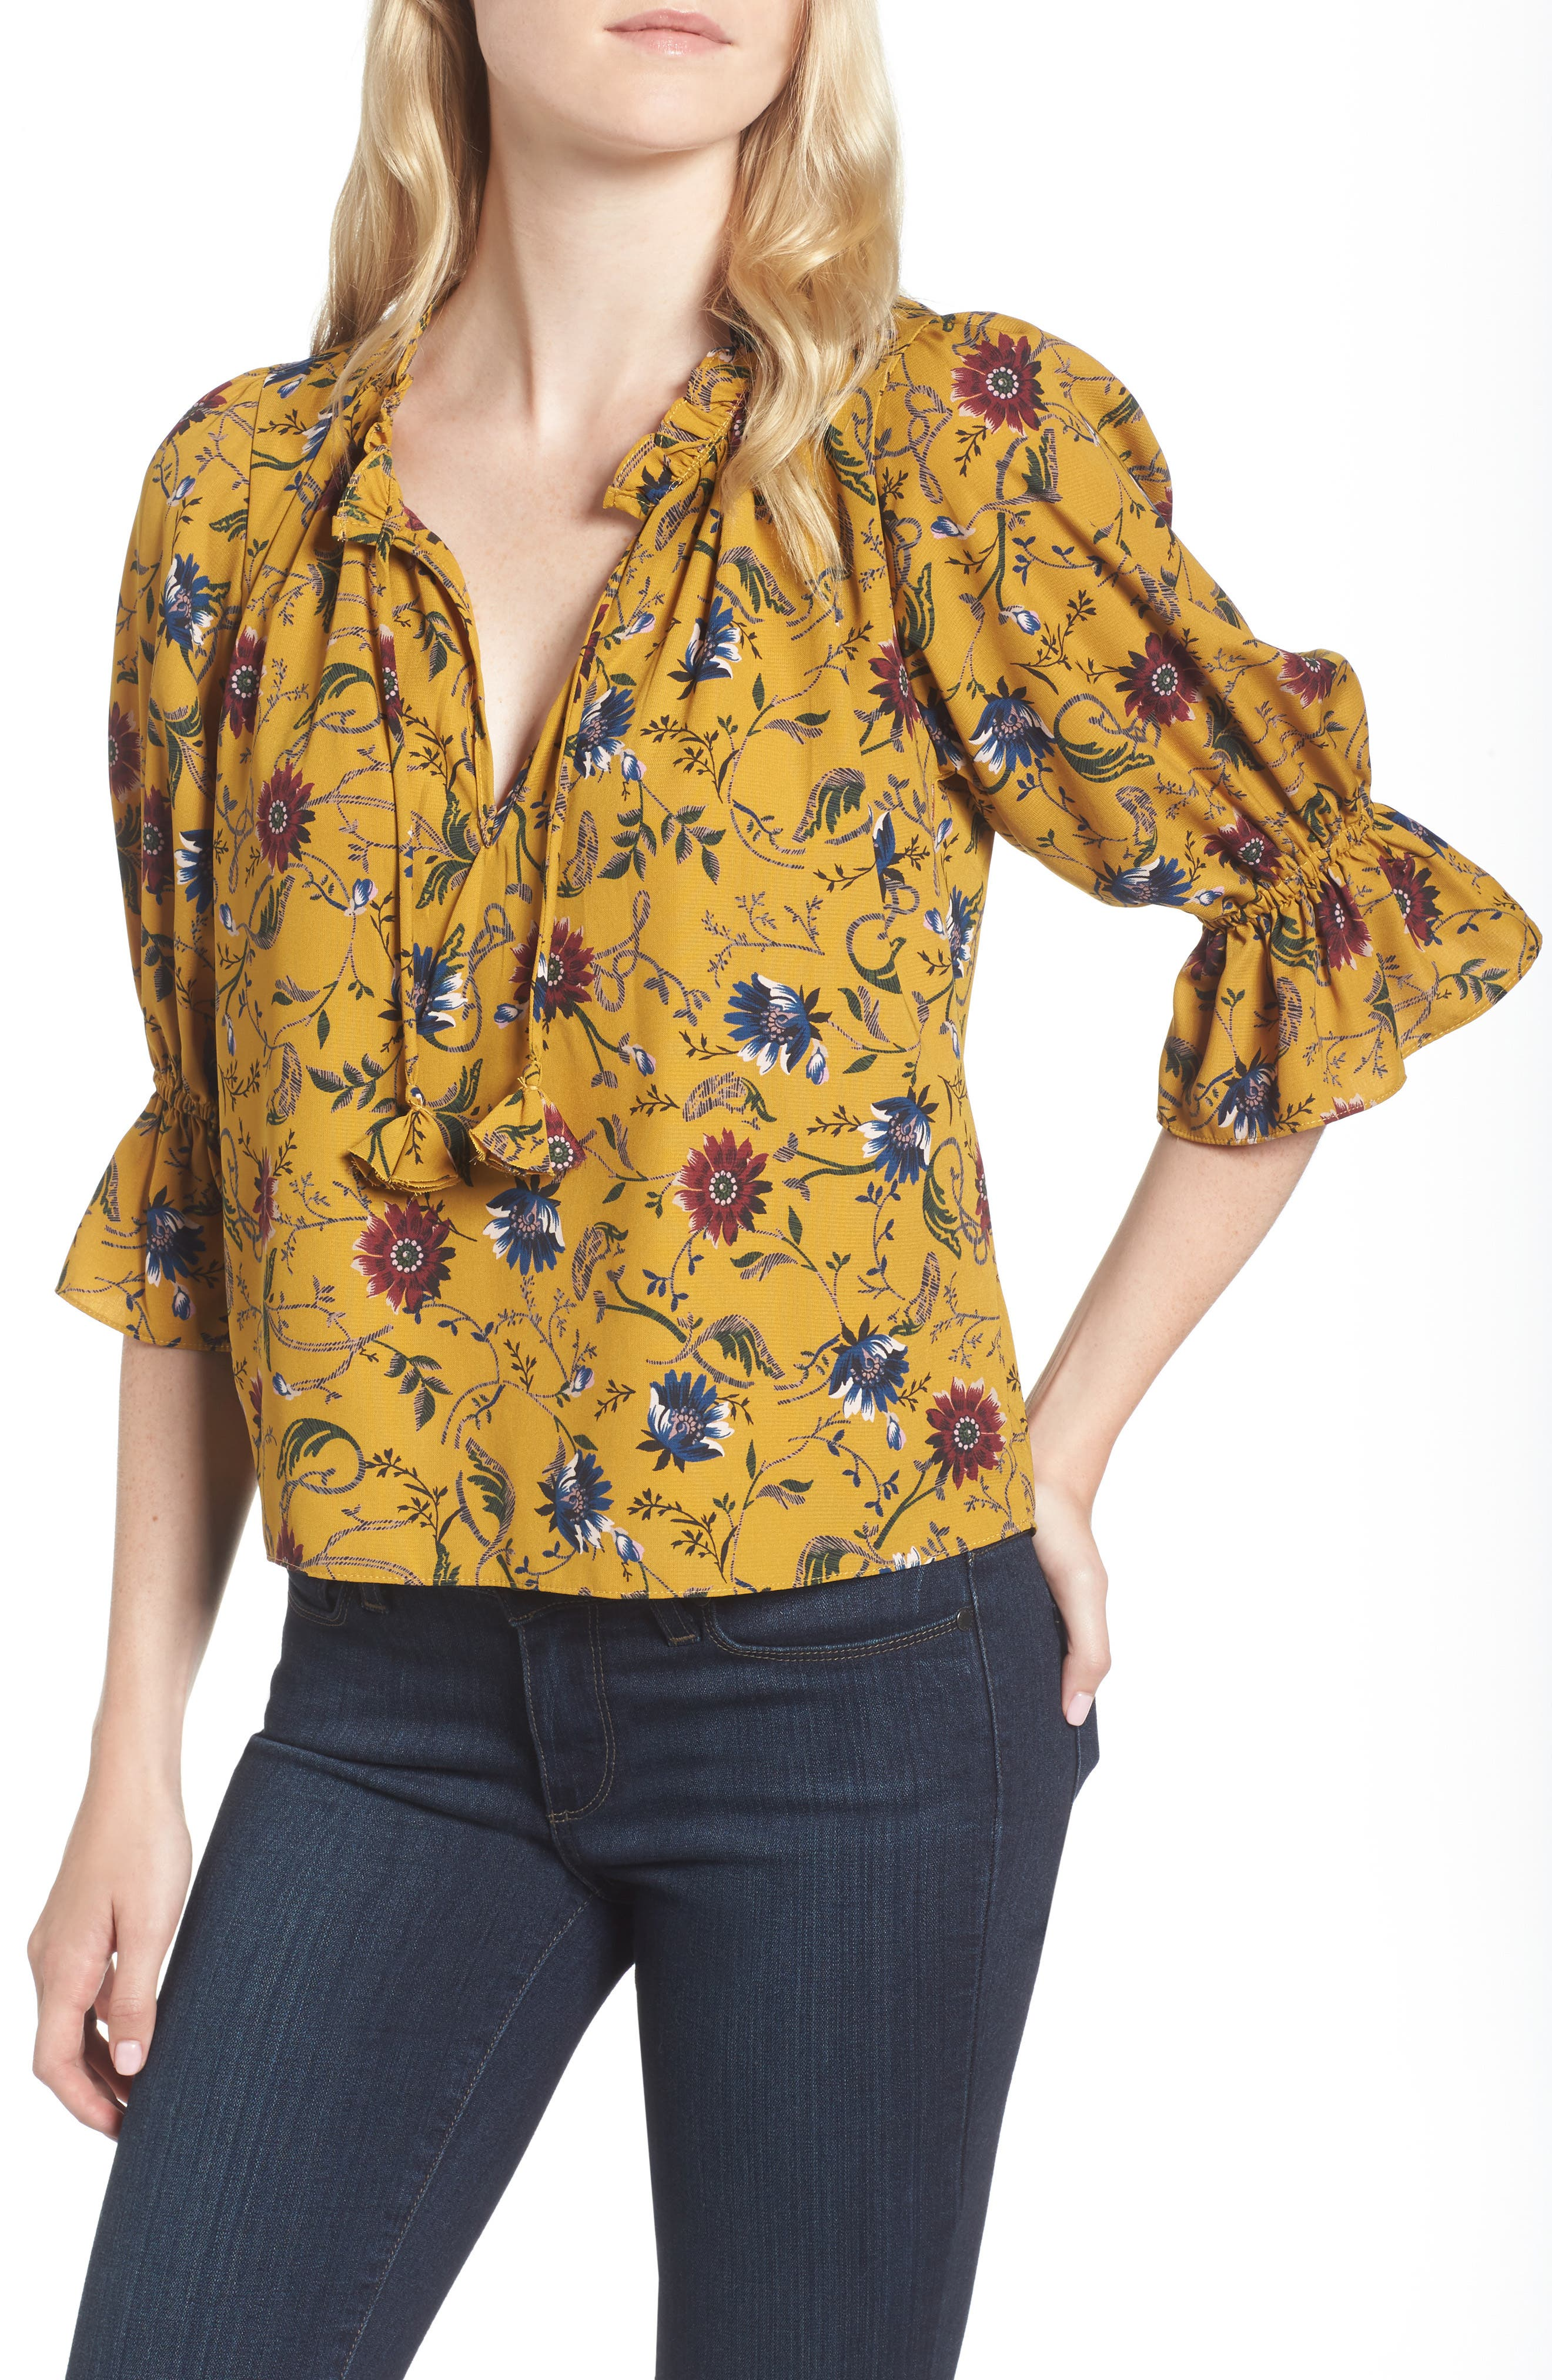 Danee Floral Top,                             Main thumbnail 1, color,                             Marigold/ Ivory